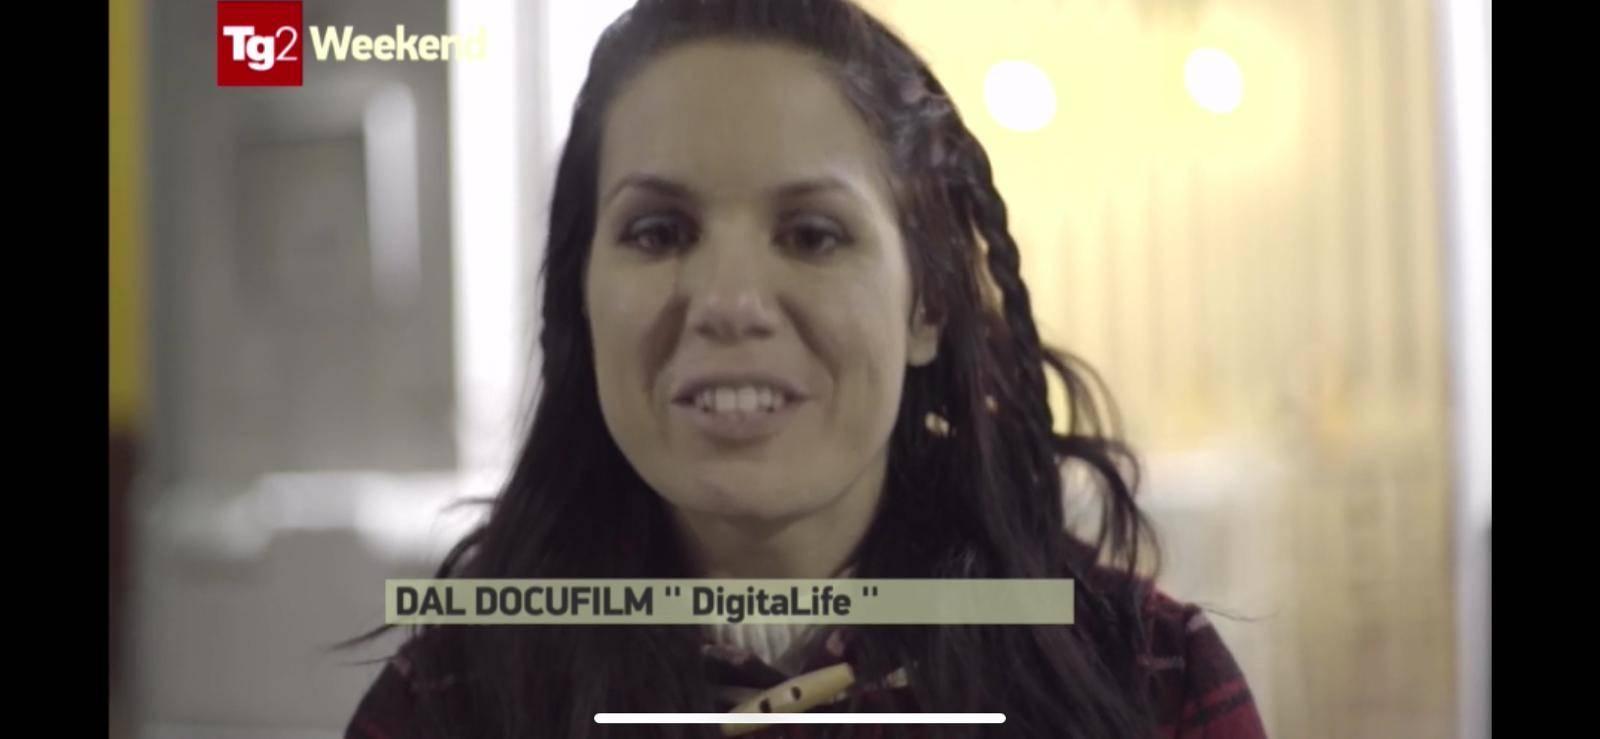 Digitalife a Tg2 weekend